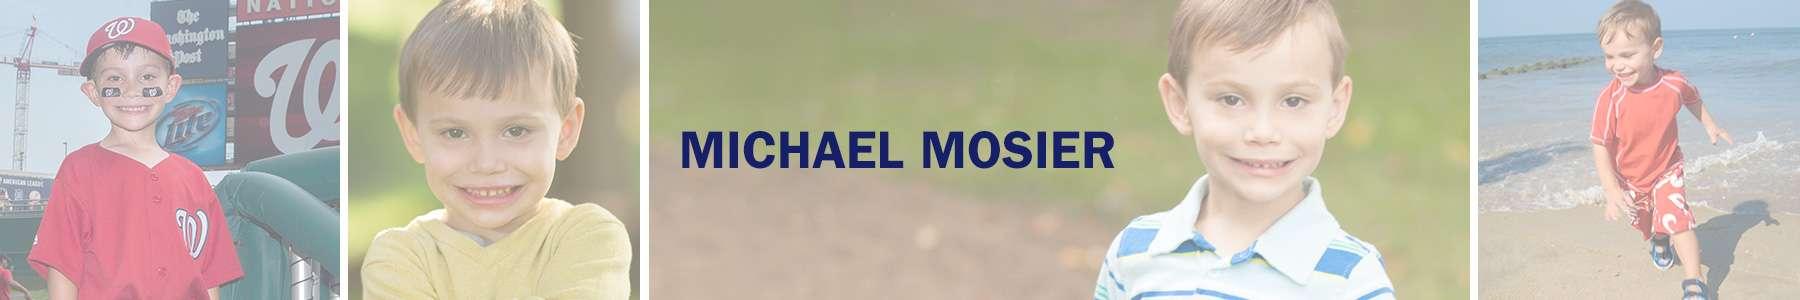 Michael Mosier